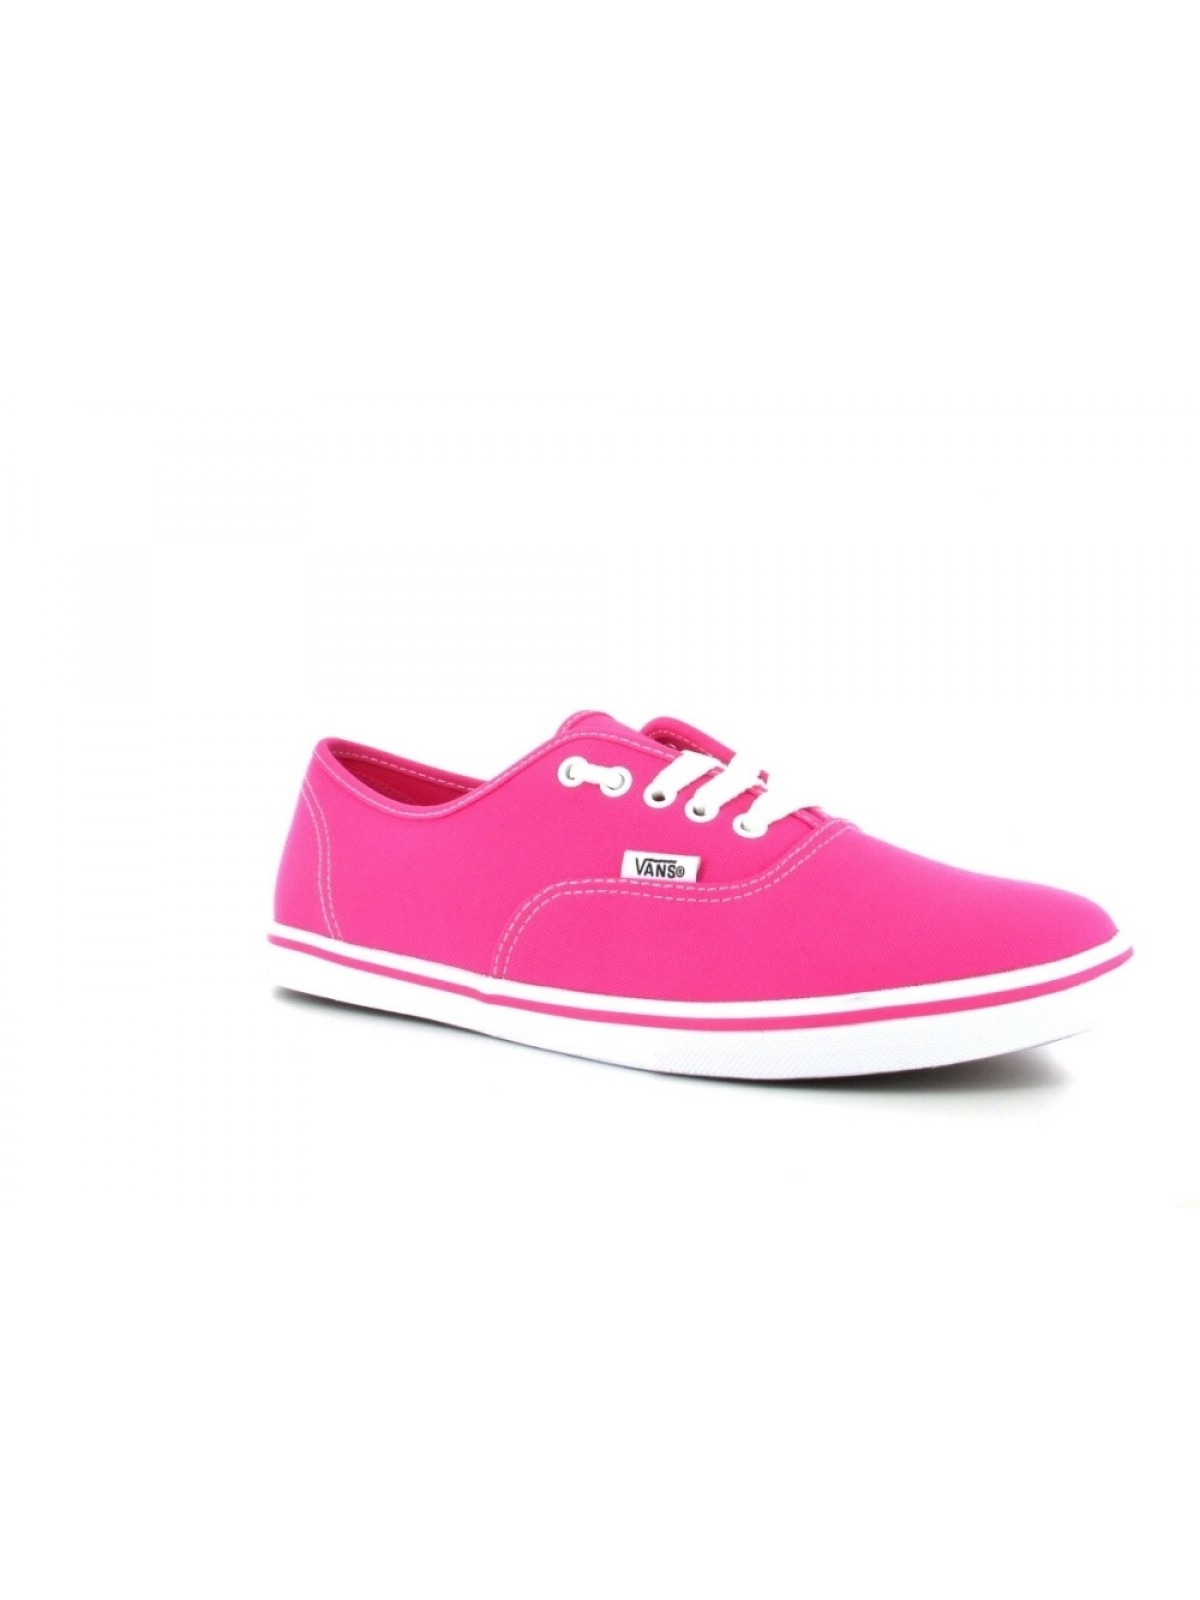 Vans Z Lopro toile néon pink